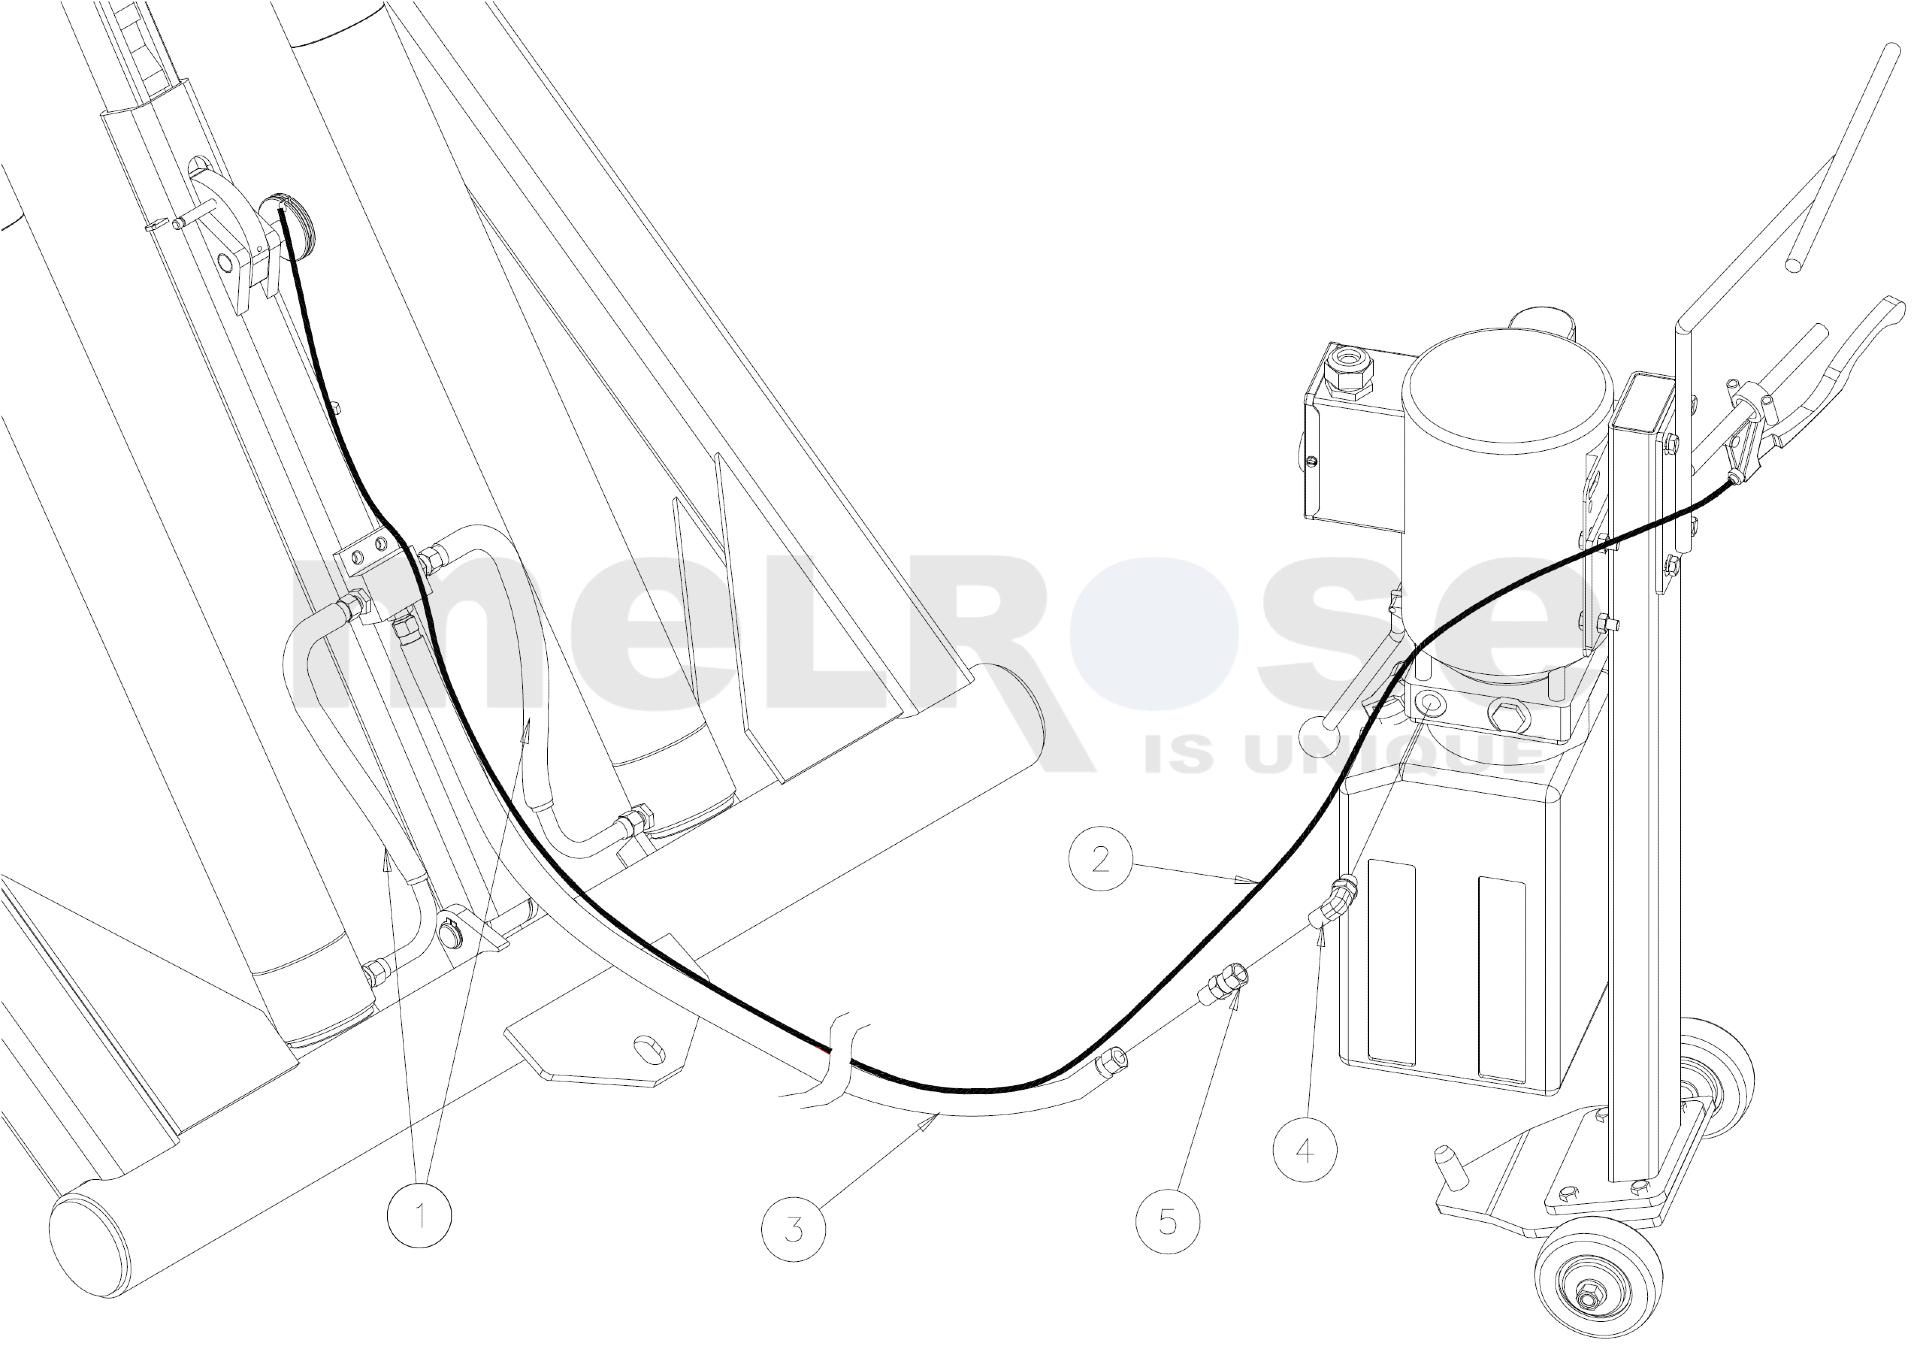 mr6-hydraulic-lock-release-diagram-marked.jpg